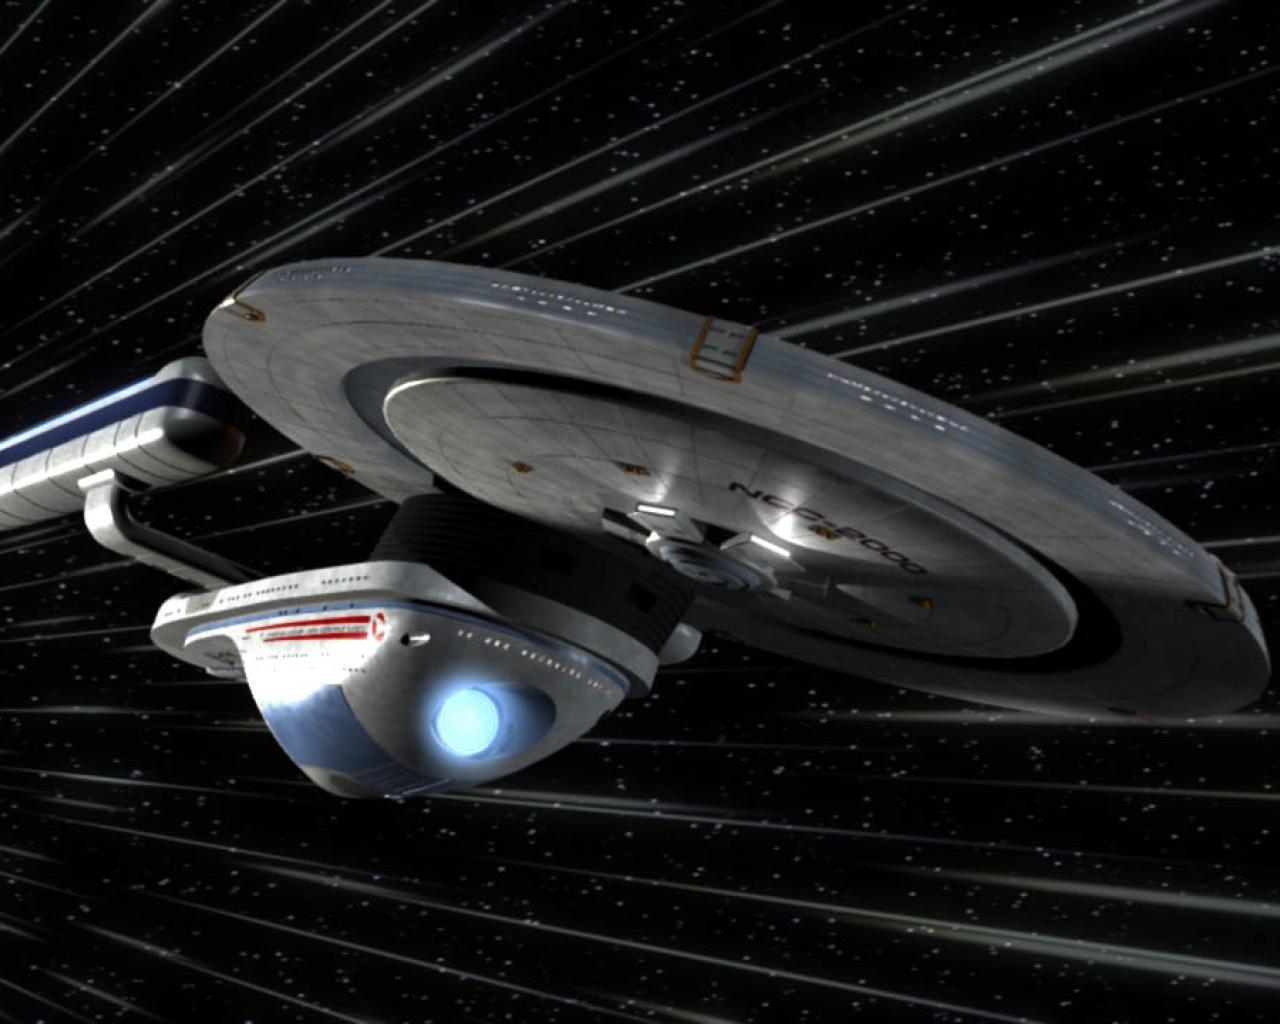 Star Trek Wallpaper 1280X1024